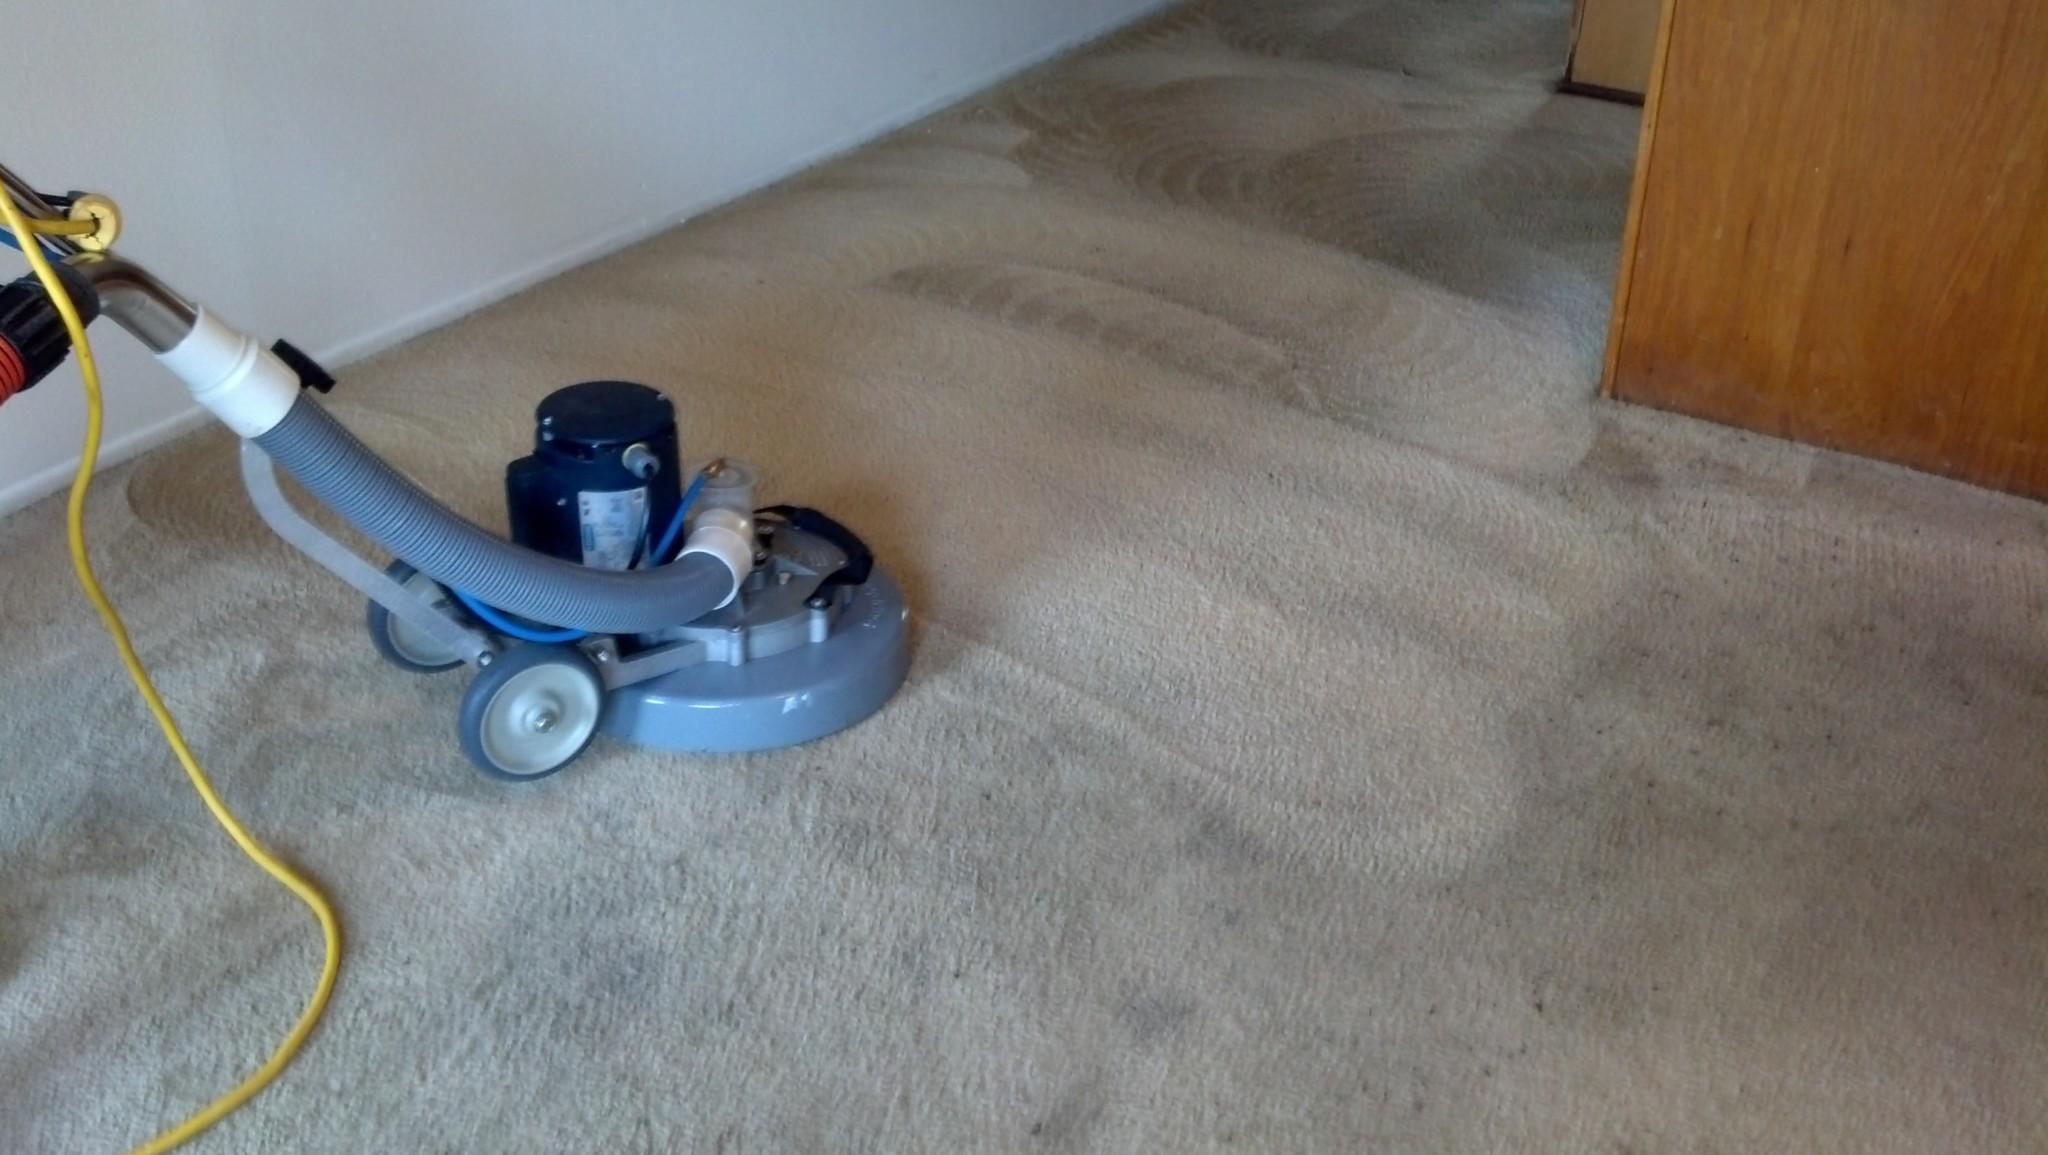 Carpet Cleaned in Santa Rosa Beach Florida